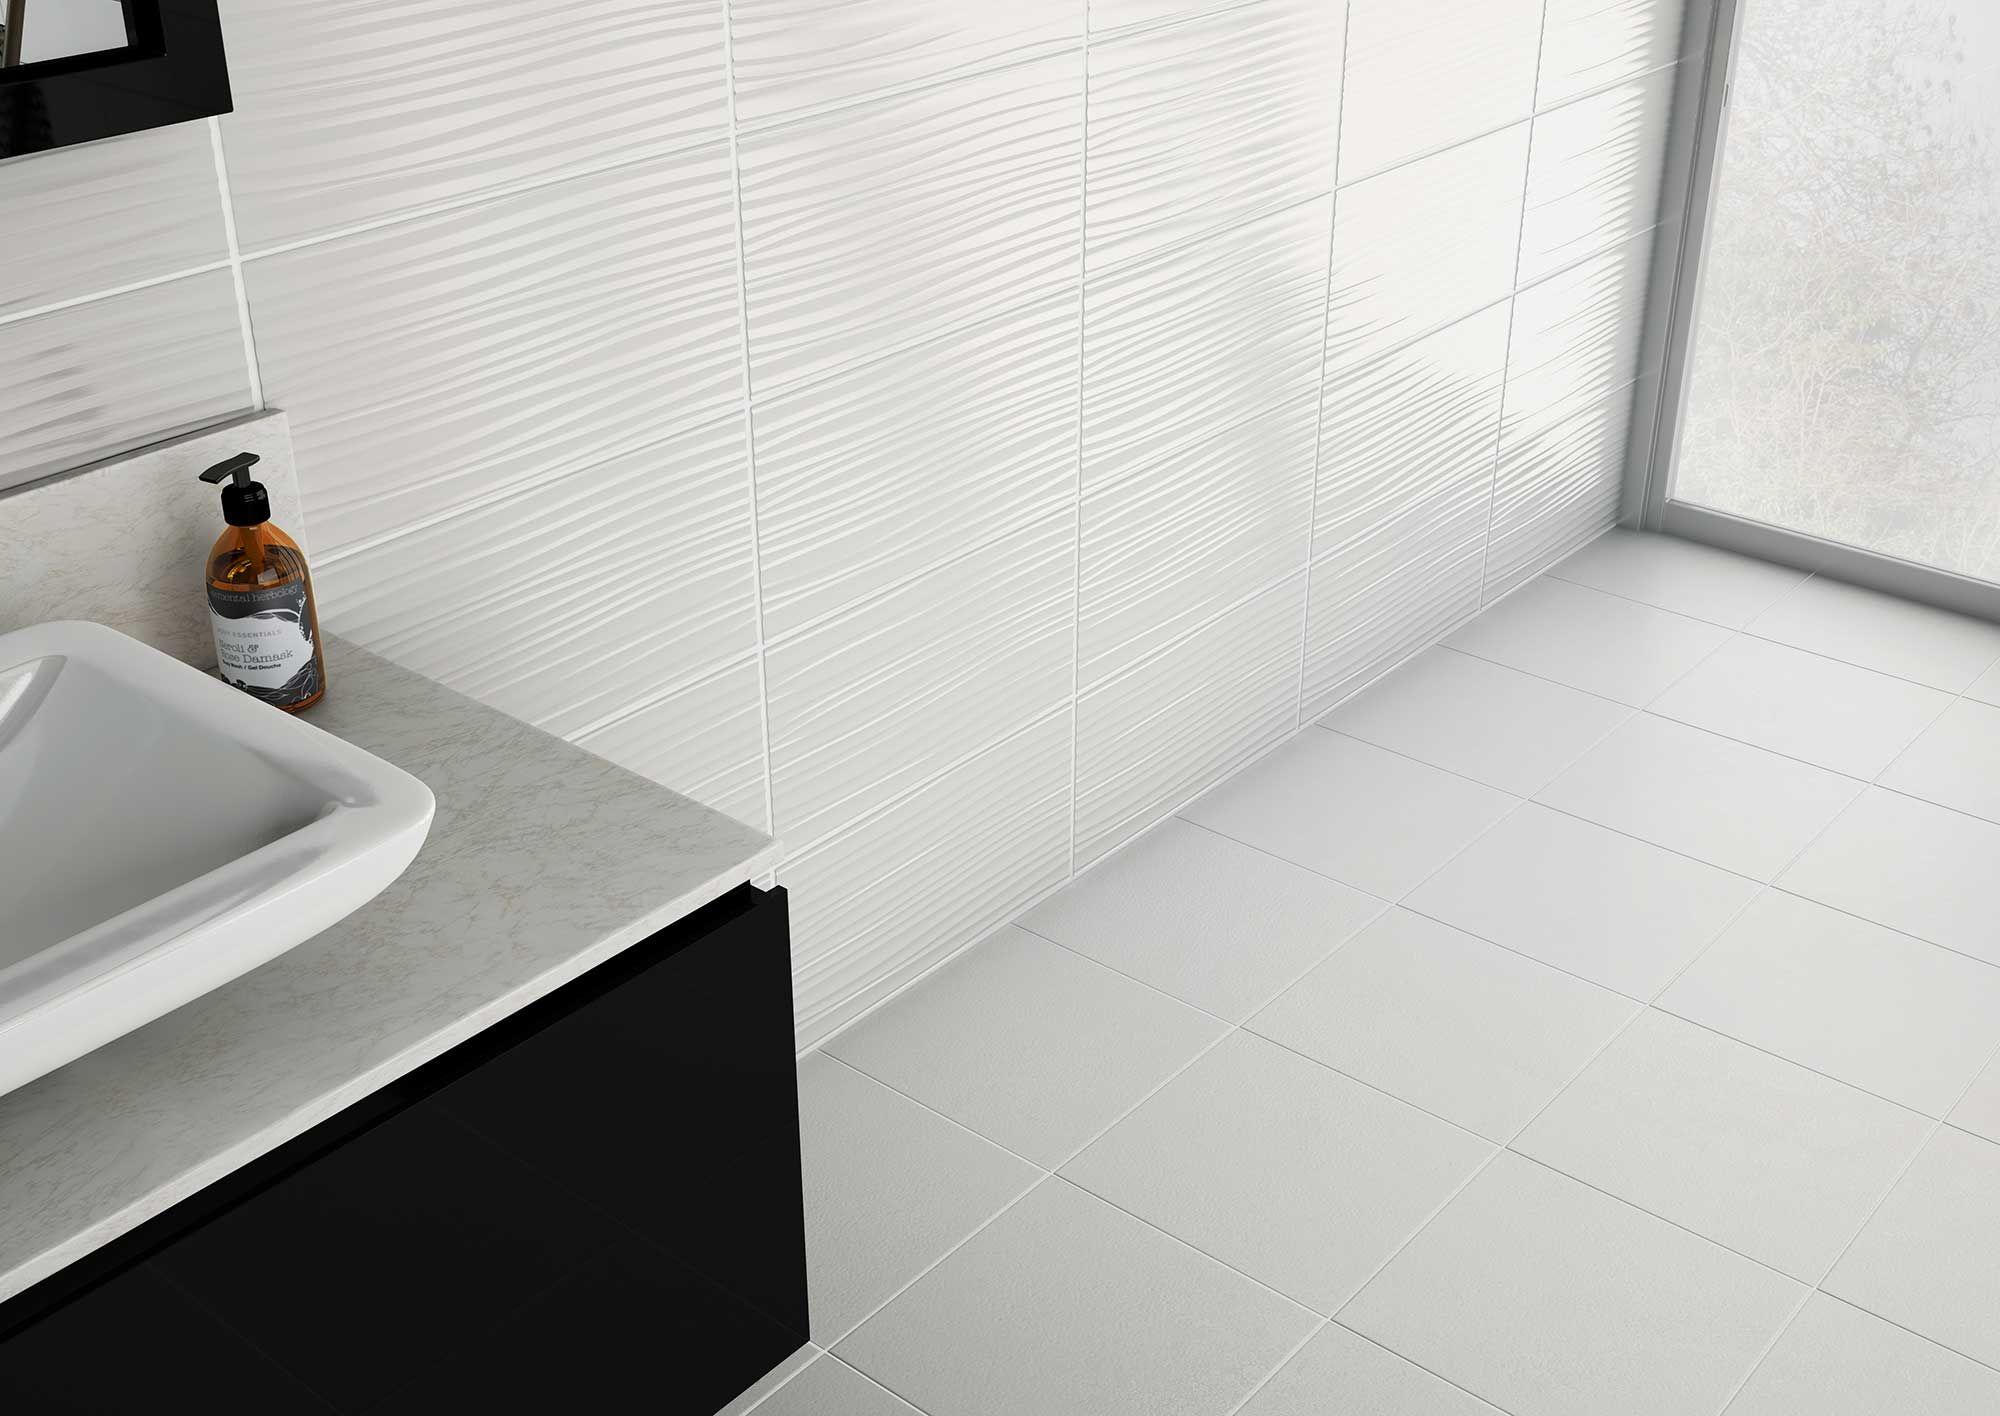 Importer Distributor Retailer Fabricator Contemporary Tile Stone Tiles Flooring Options